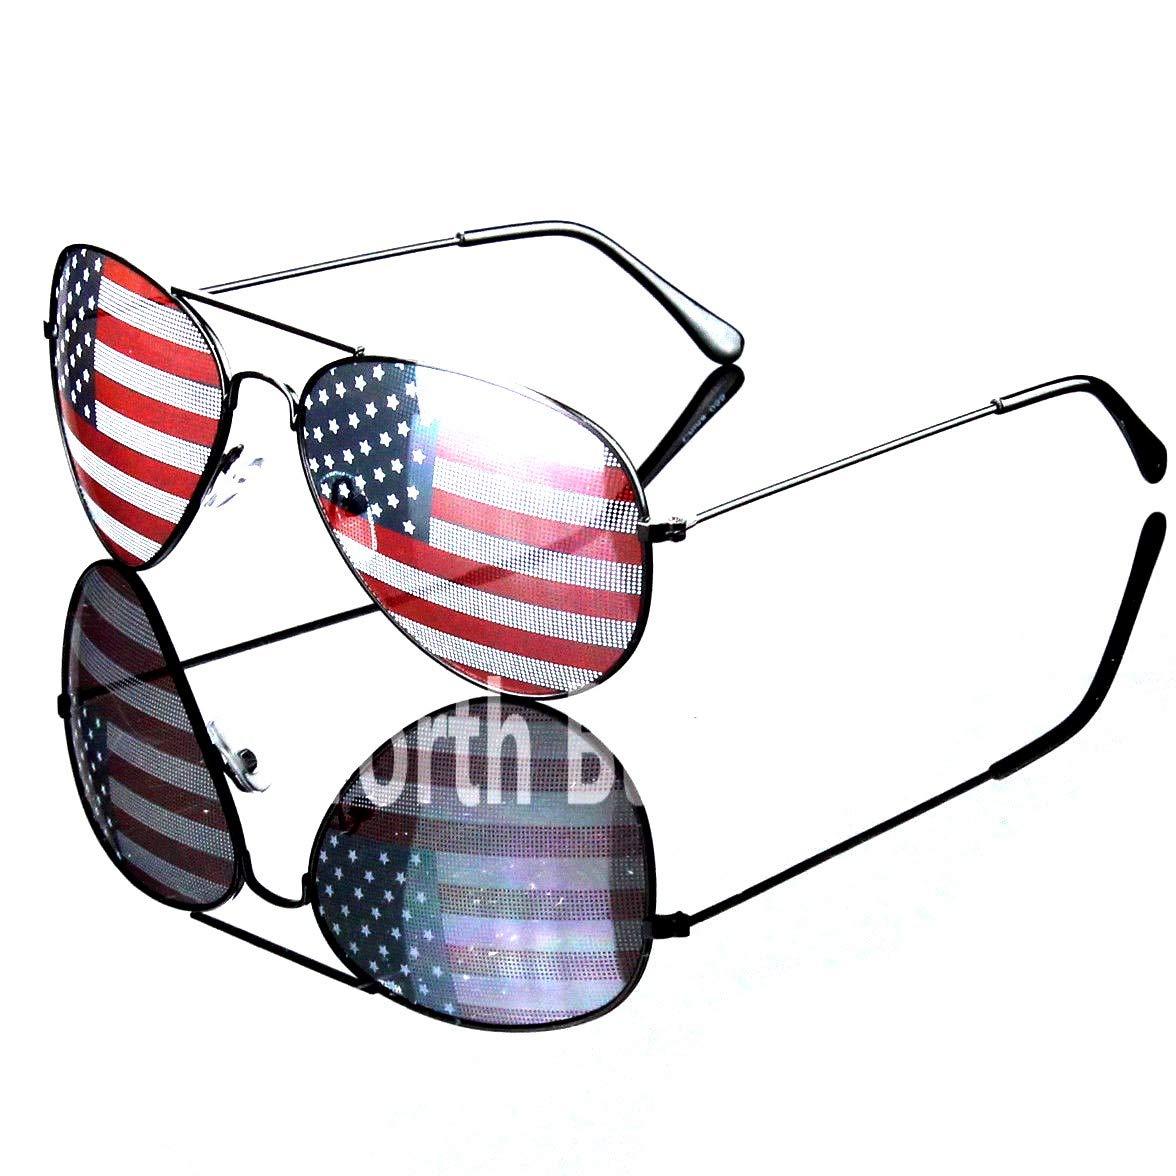 Stars and stripes sunglasses clipart transparent library Amazon.com: Patriotic Sunglasses American Flag USA Lens Star ... transparent library